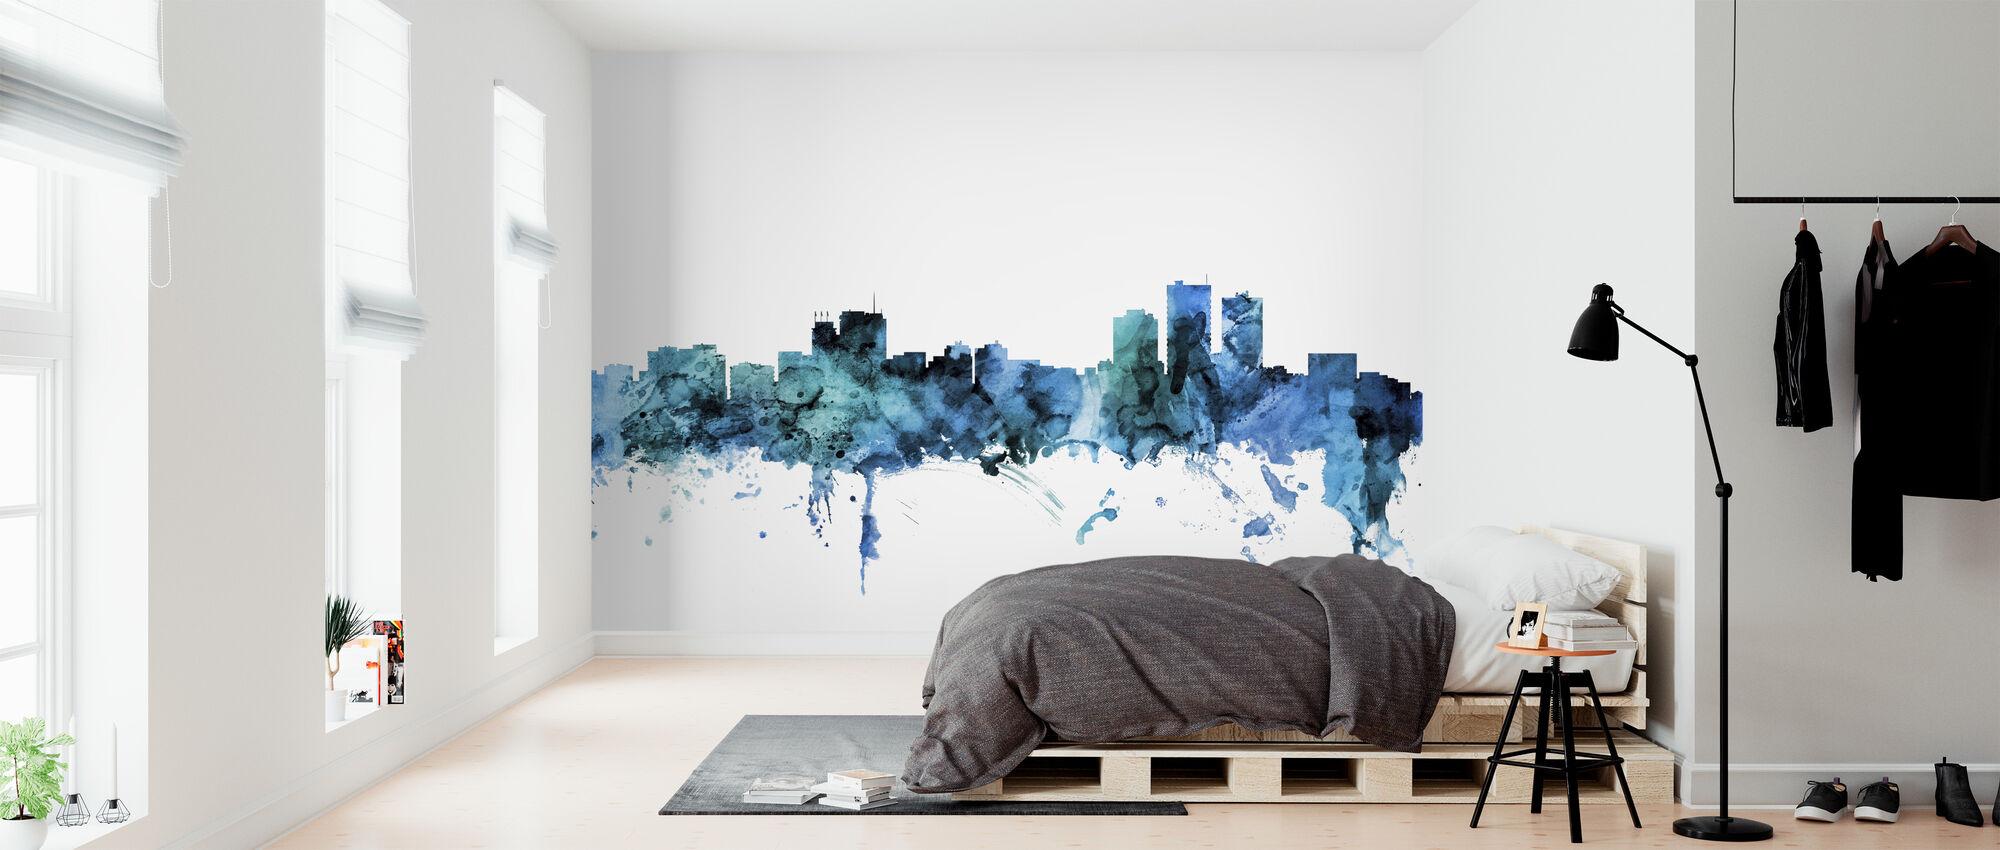 Anchorage Alaska Skyline - Wallpaper - Bedroom